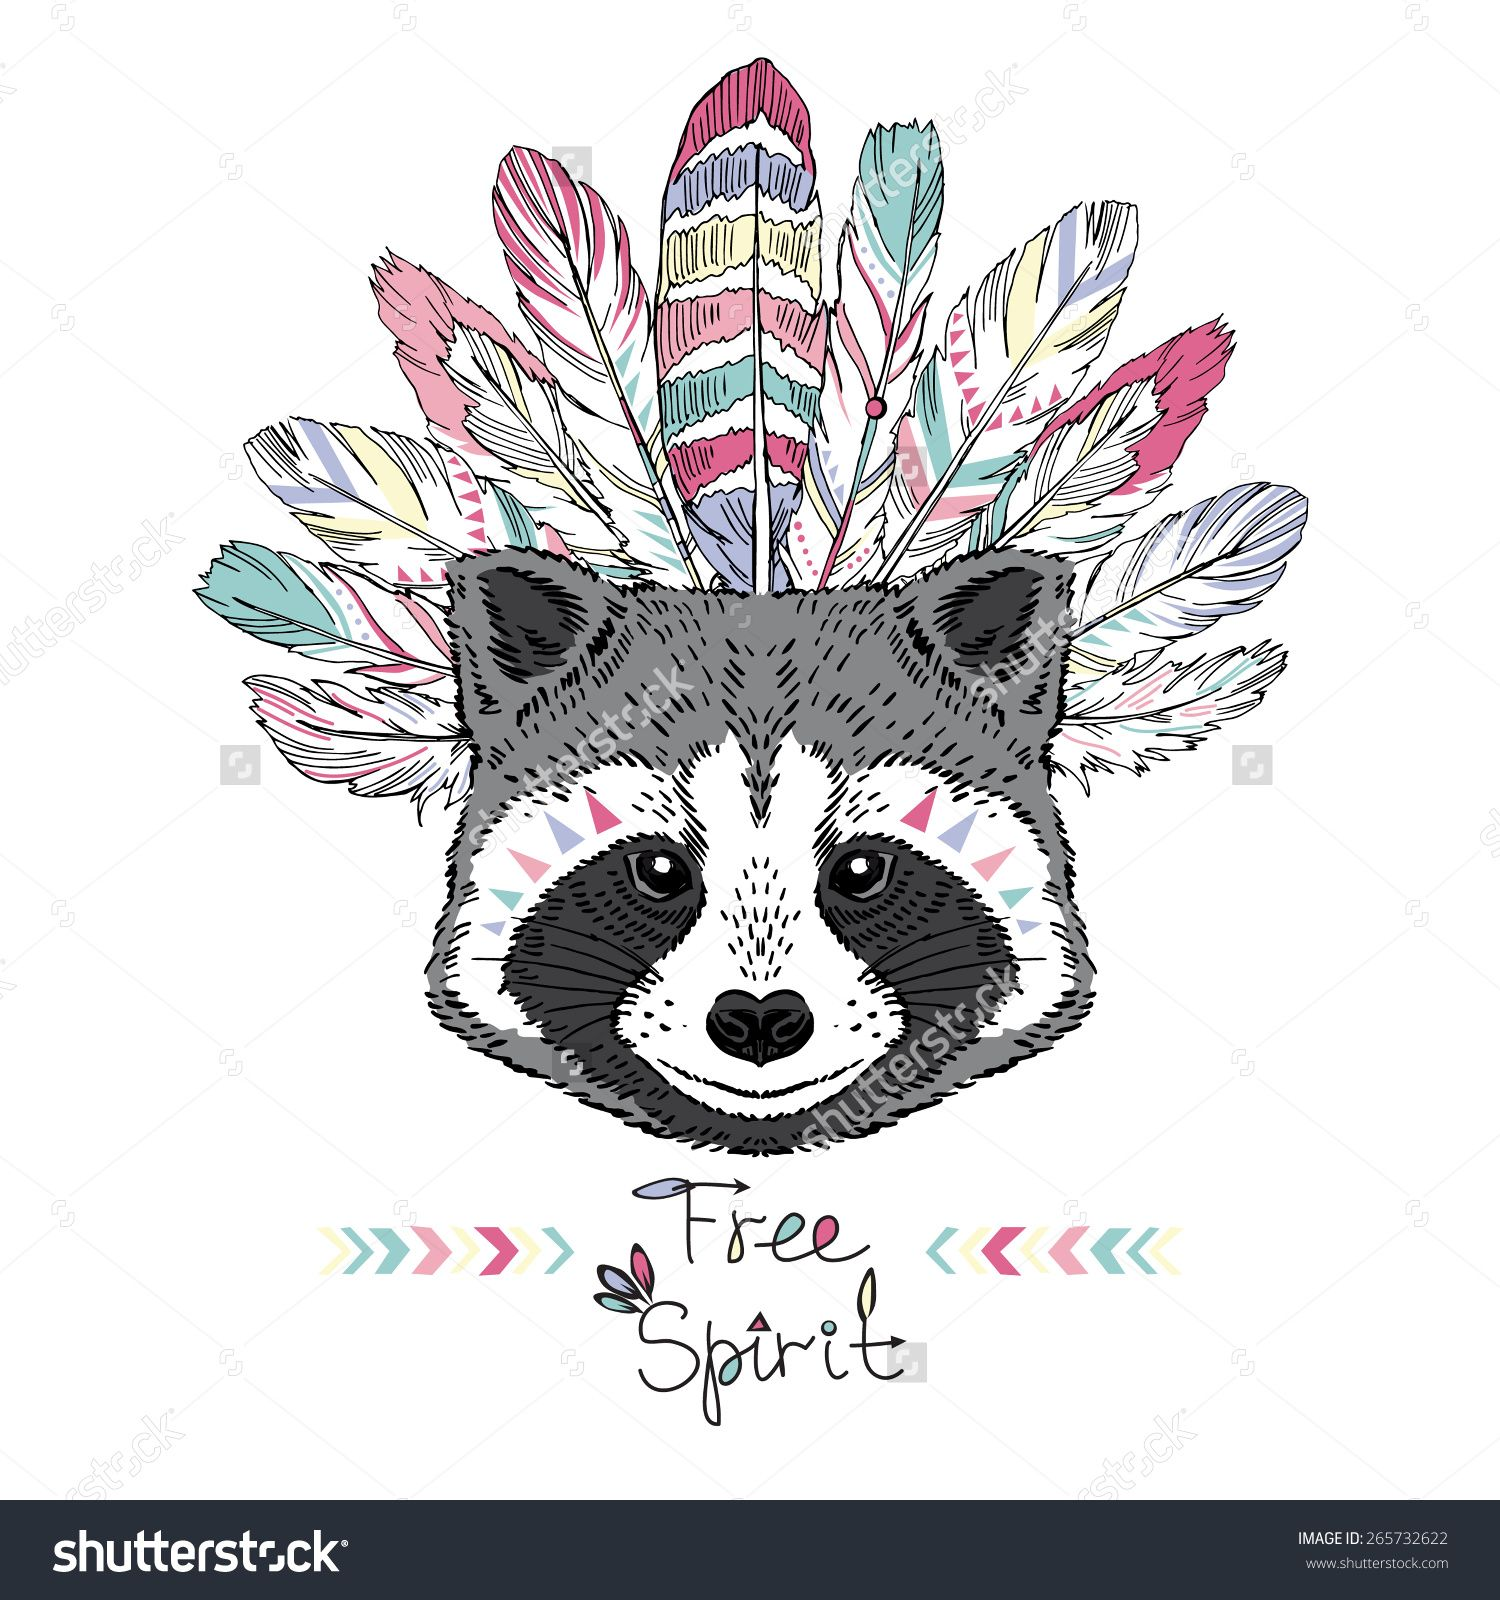 Shirt design style - Raccoon Aztec Style Hand Drawn Animal Illustration Native American Poster T Shirt